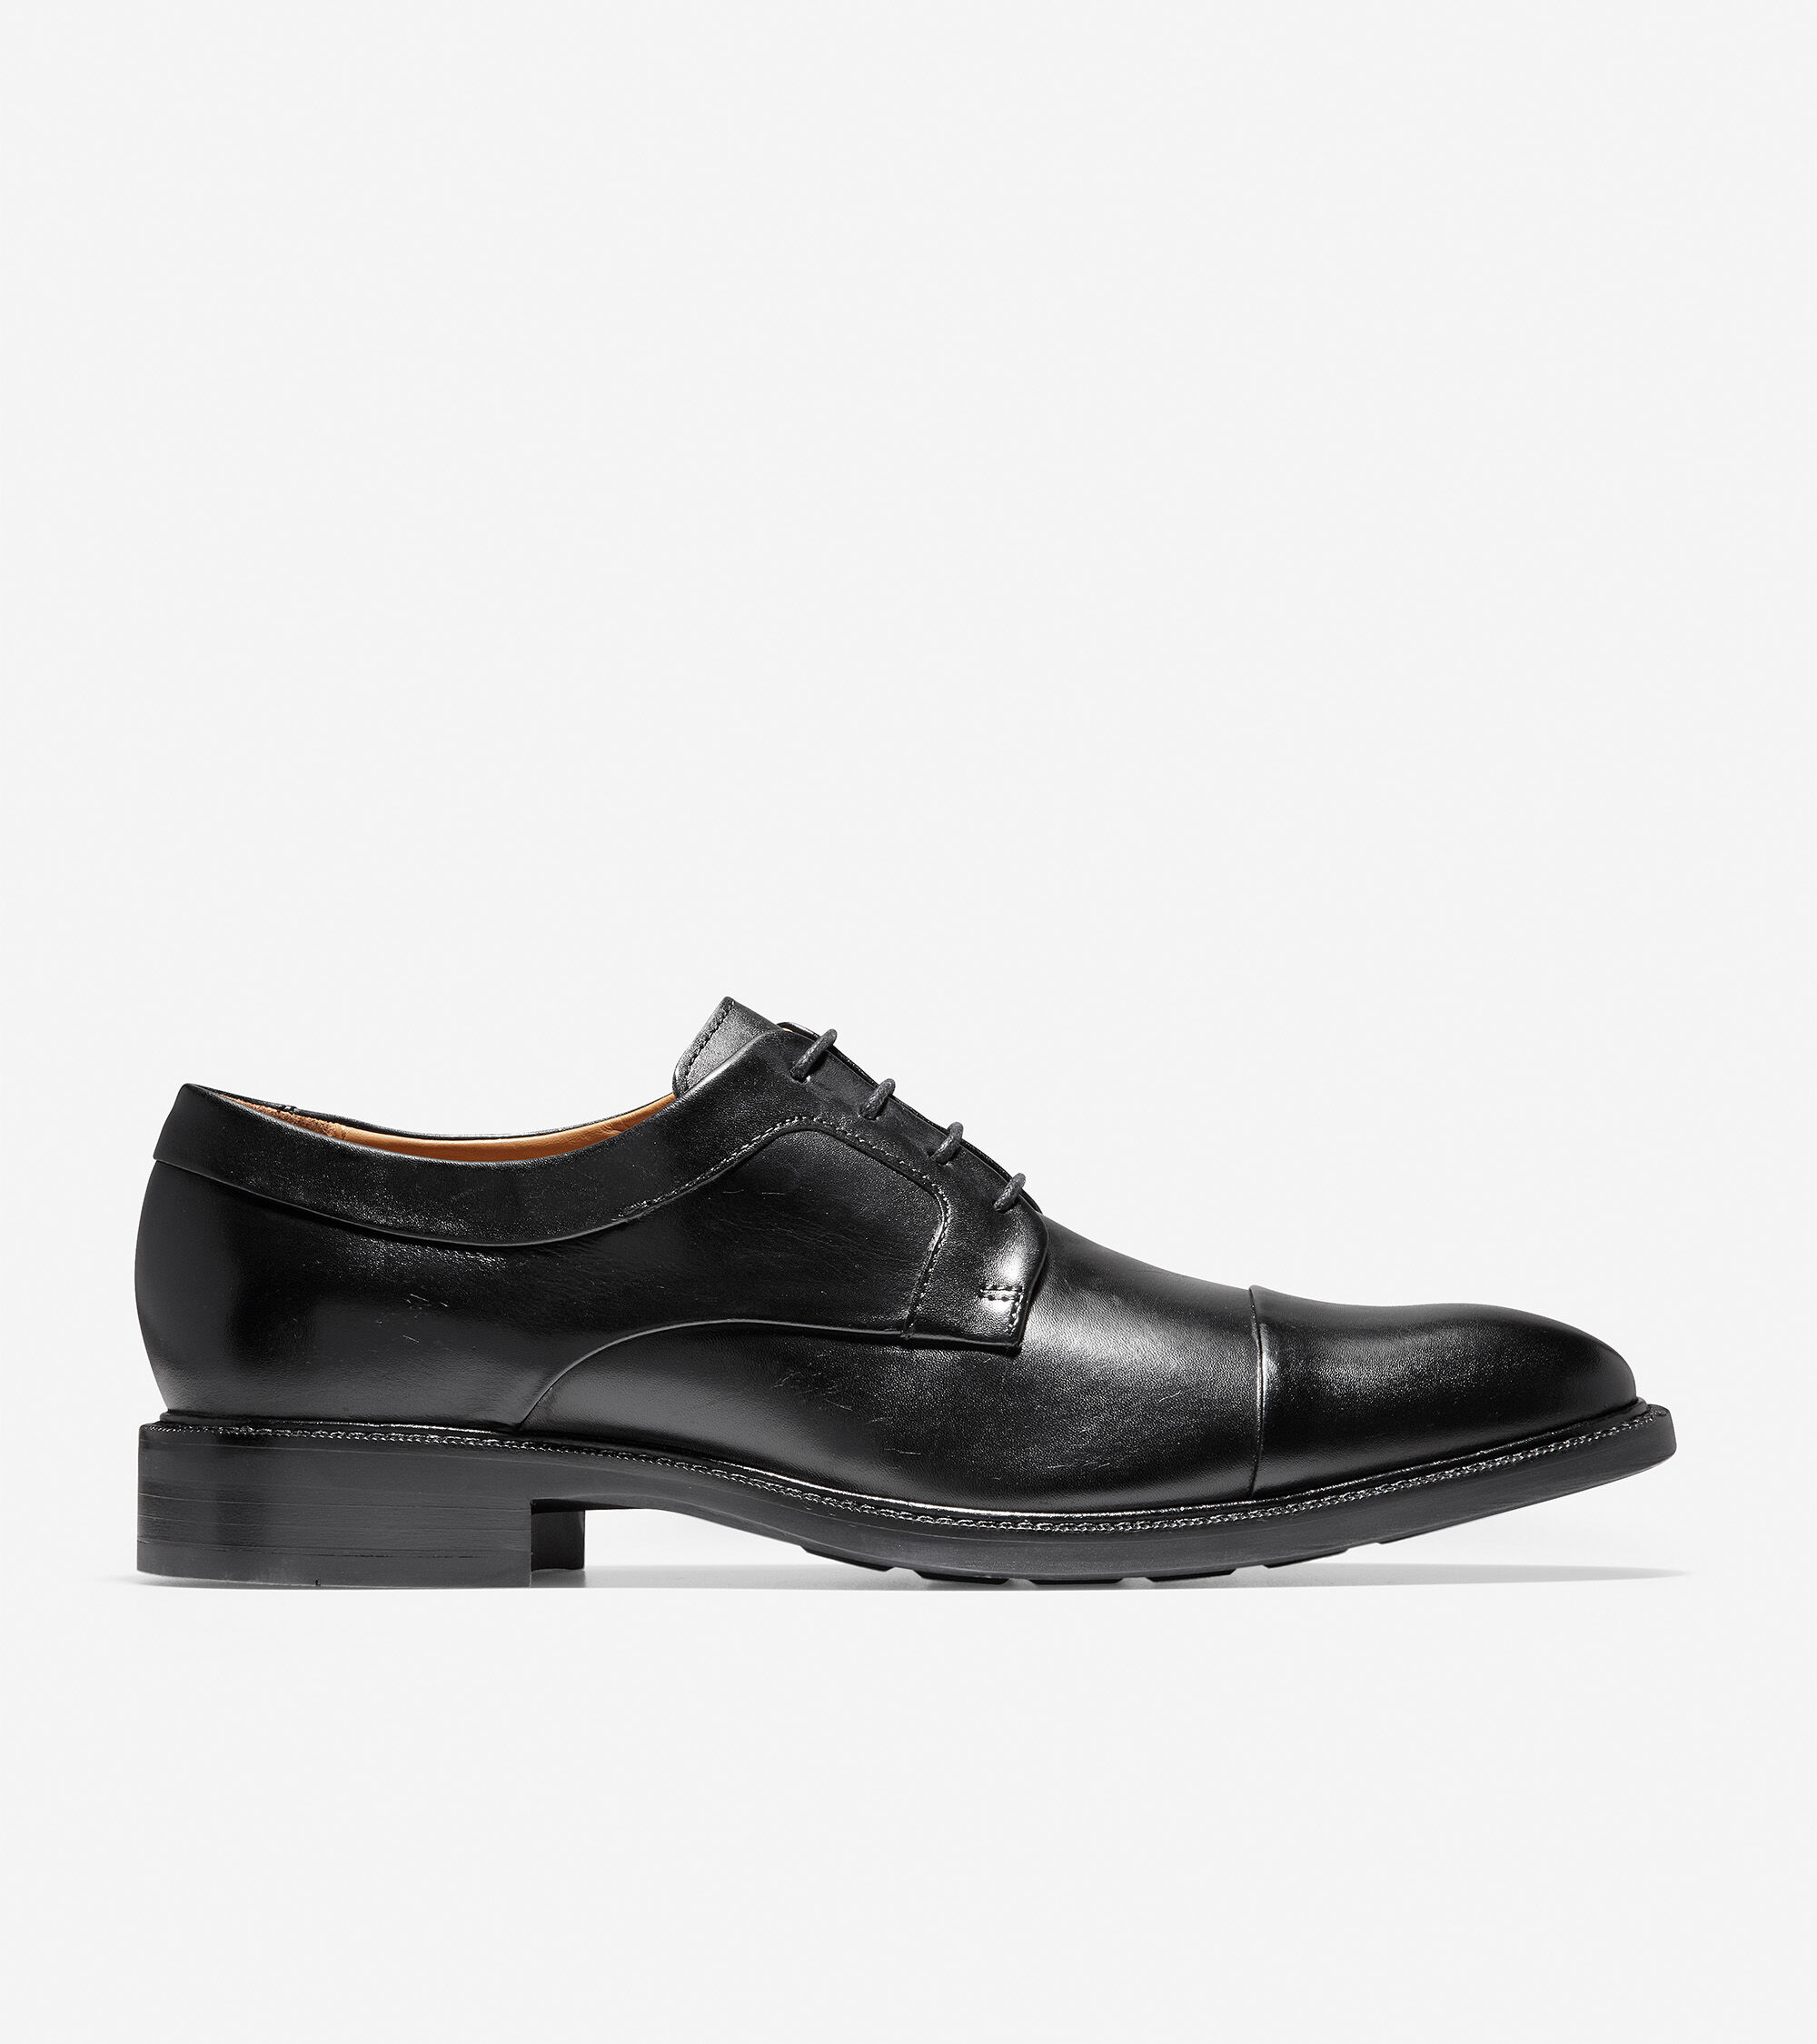 3095c36f270 Mens Warren Cap Toe Oxfords in Black